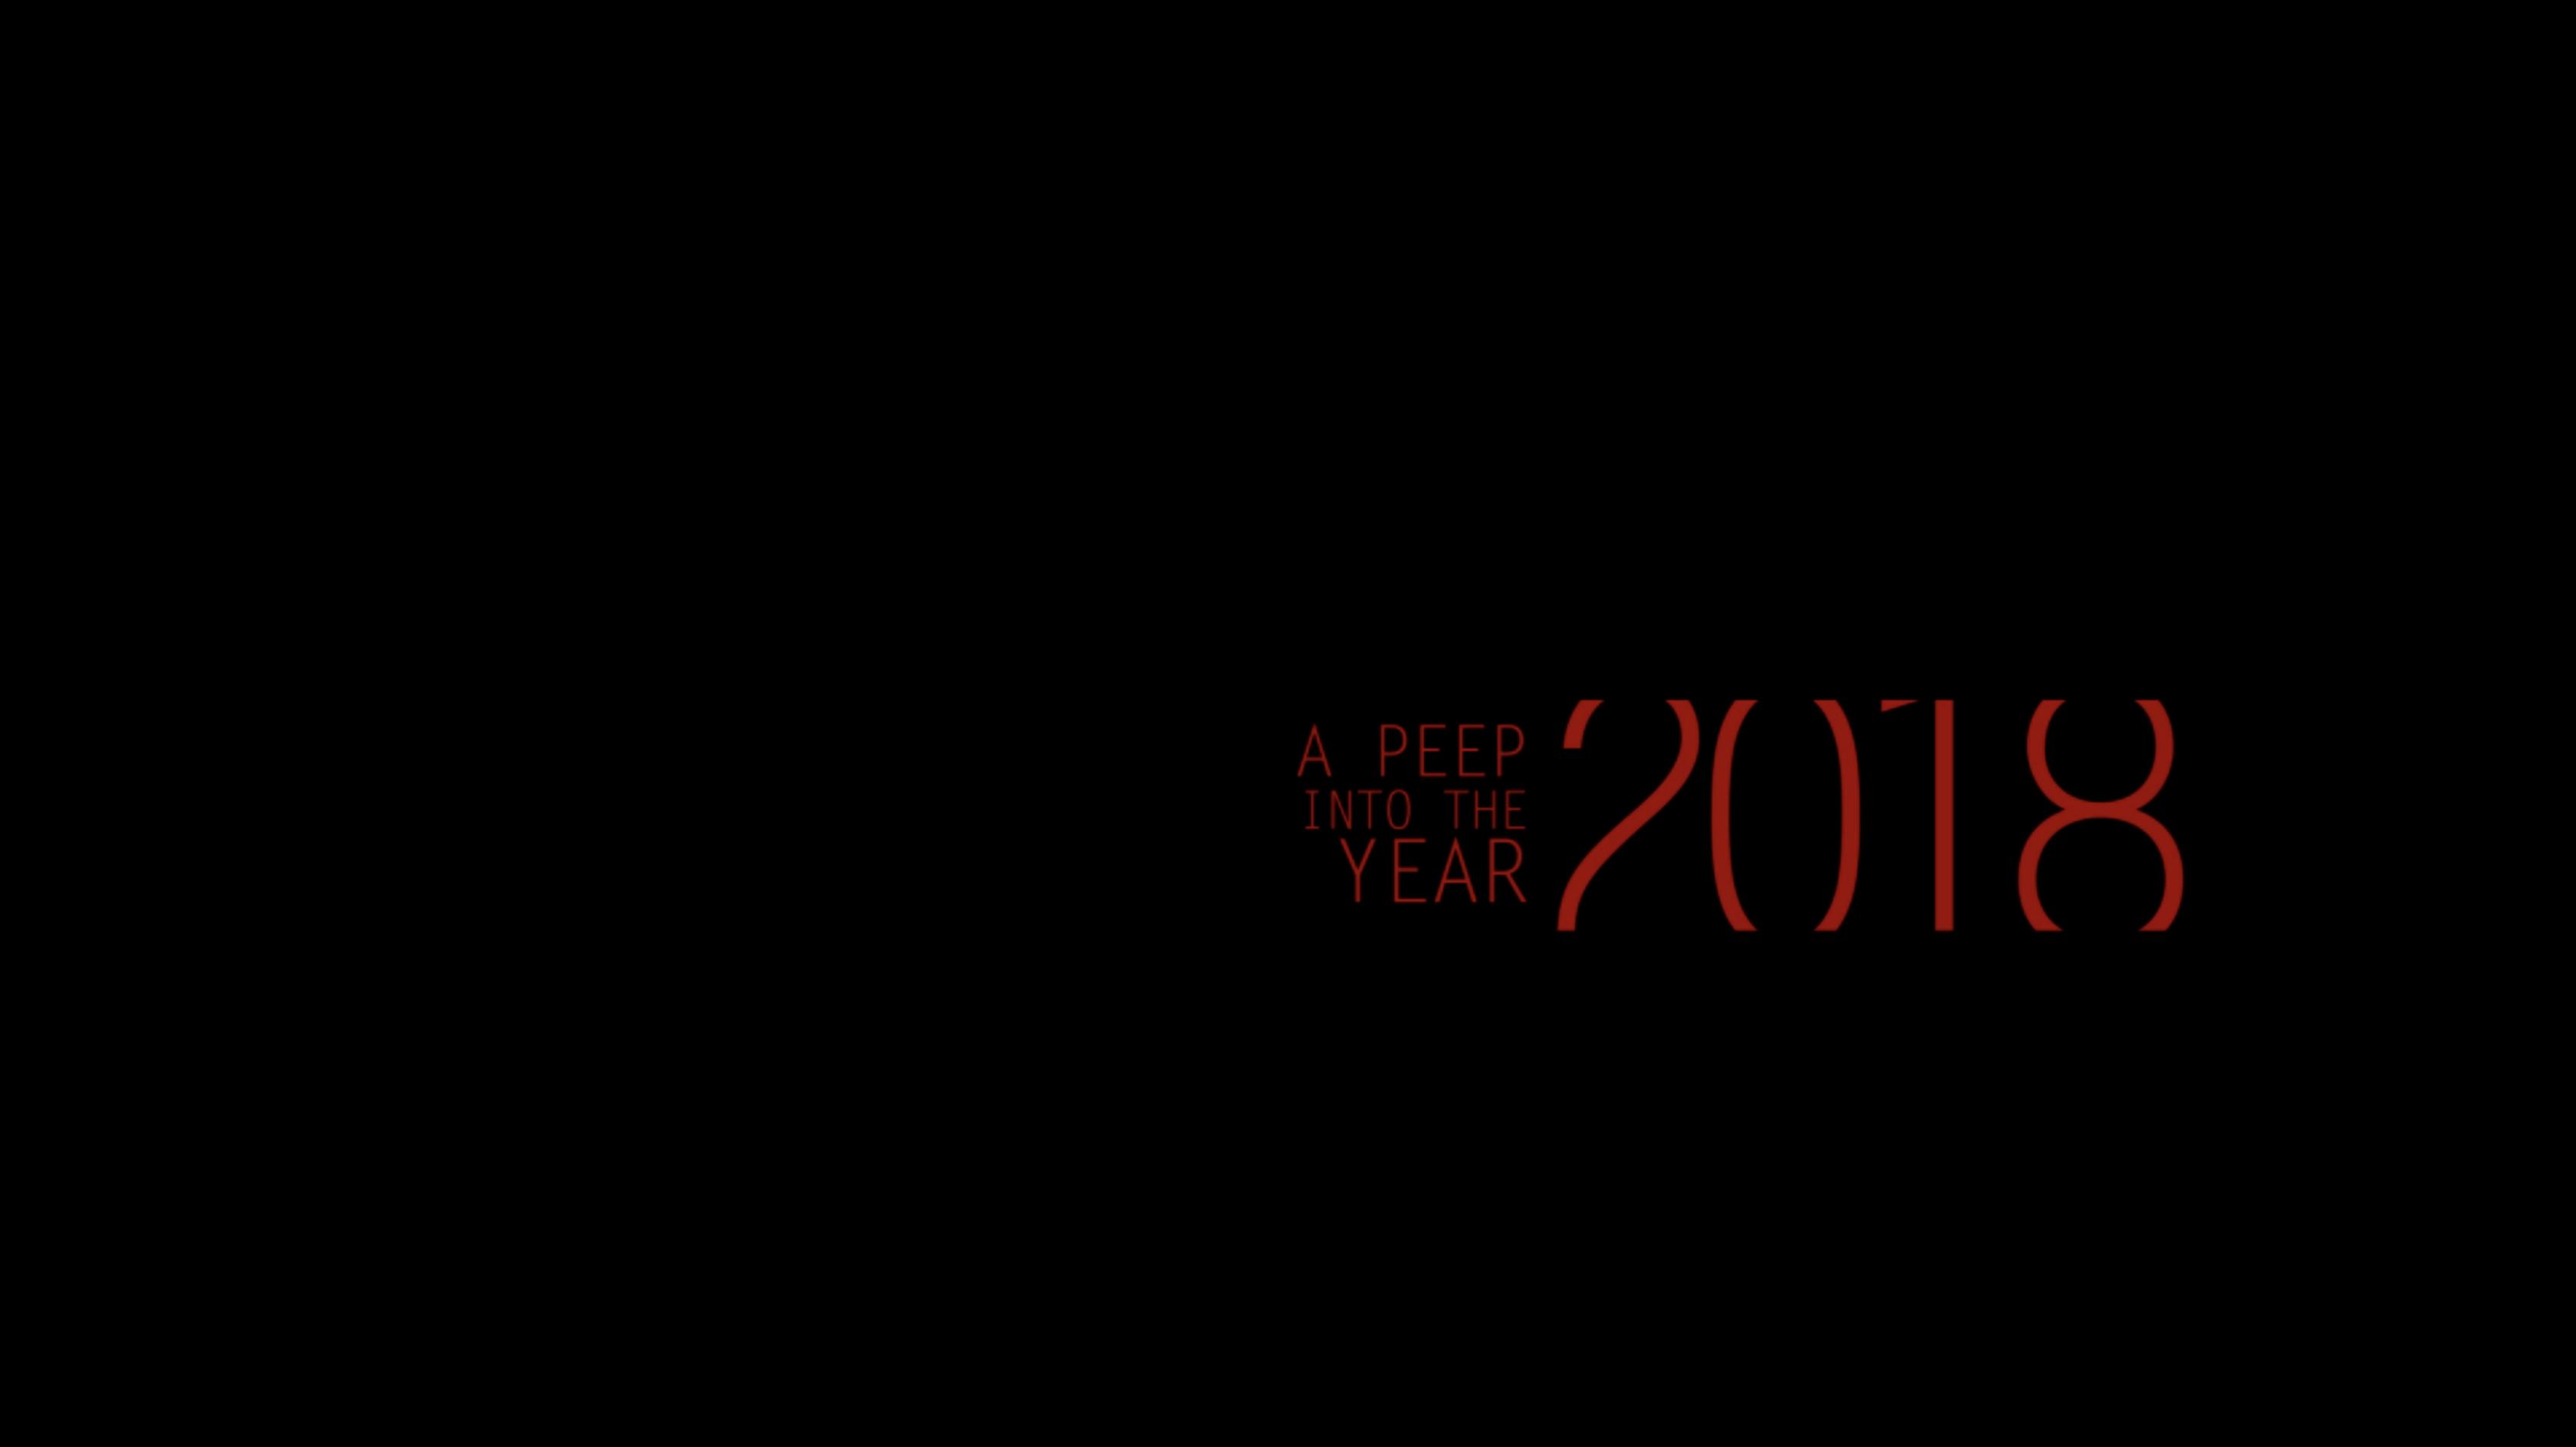 A peep into 2018